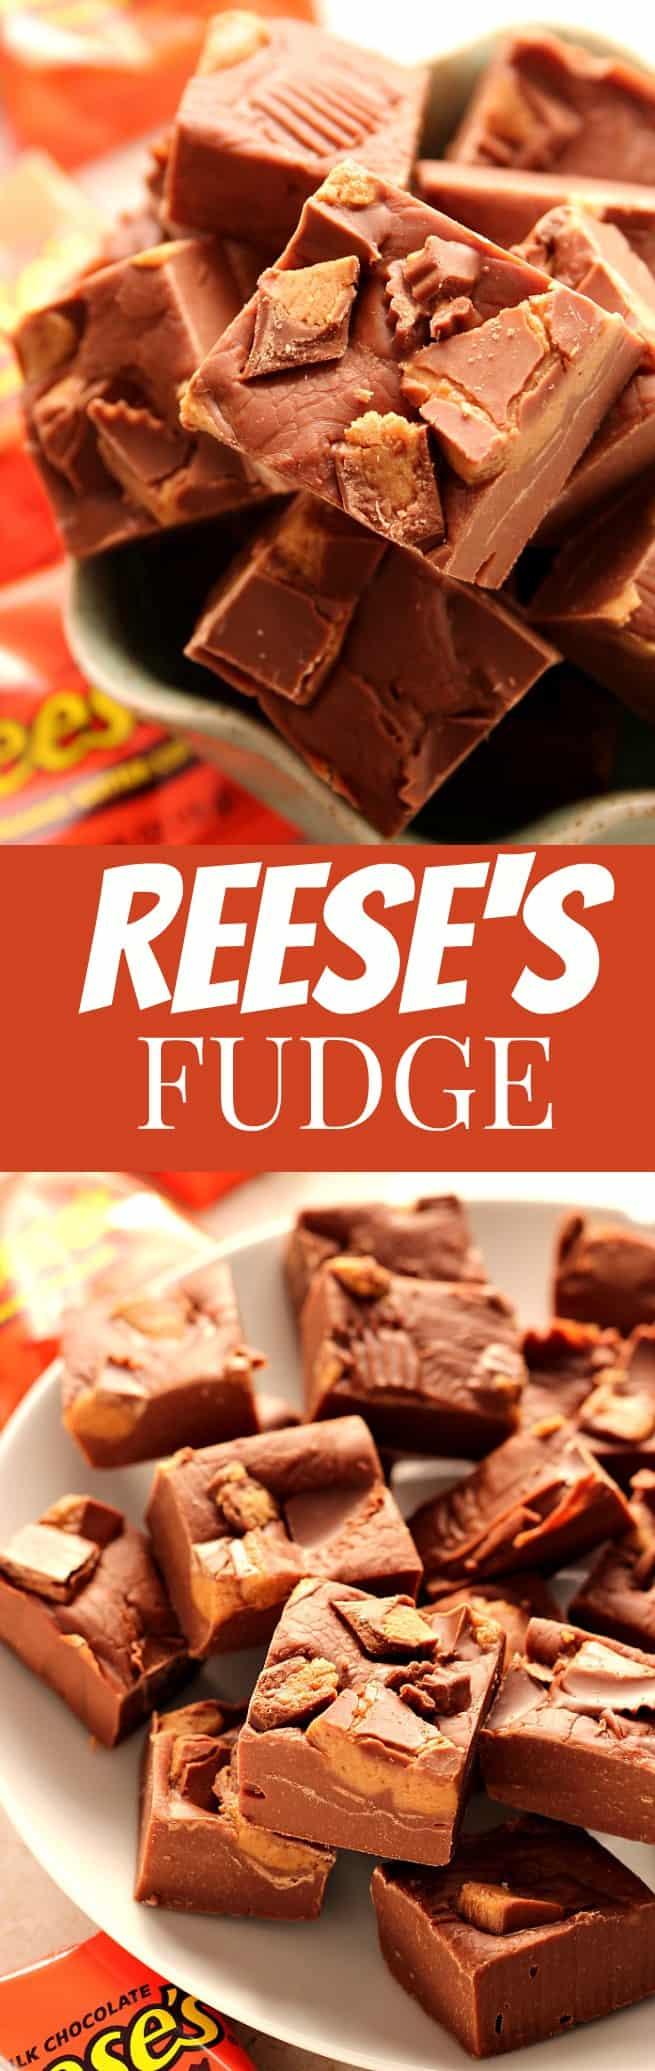 reeses fudge long Reeses Peanut Butter Cups Fudge Recipe ( 3 ingredients )